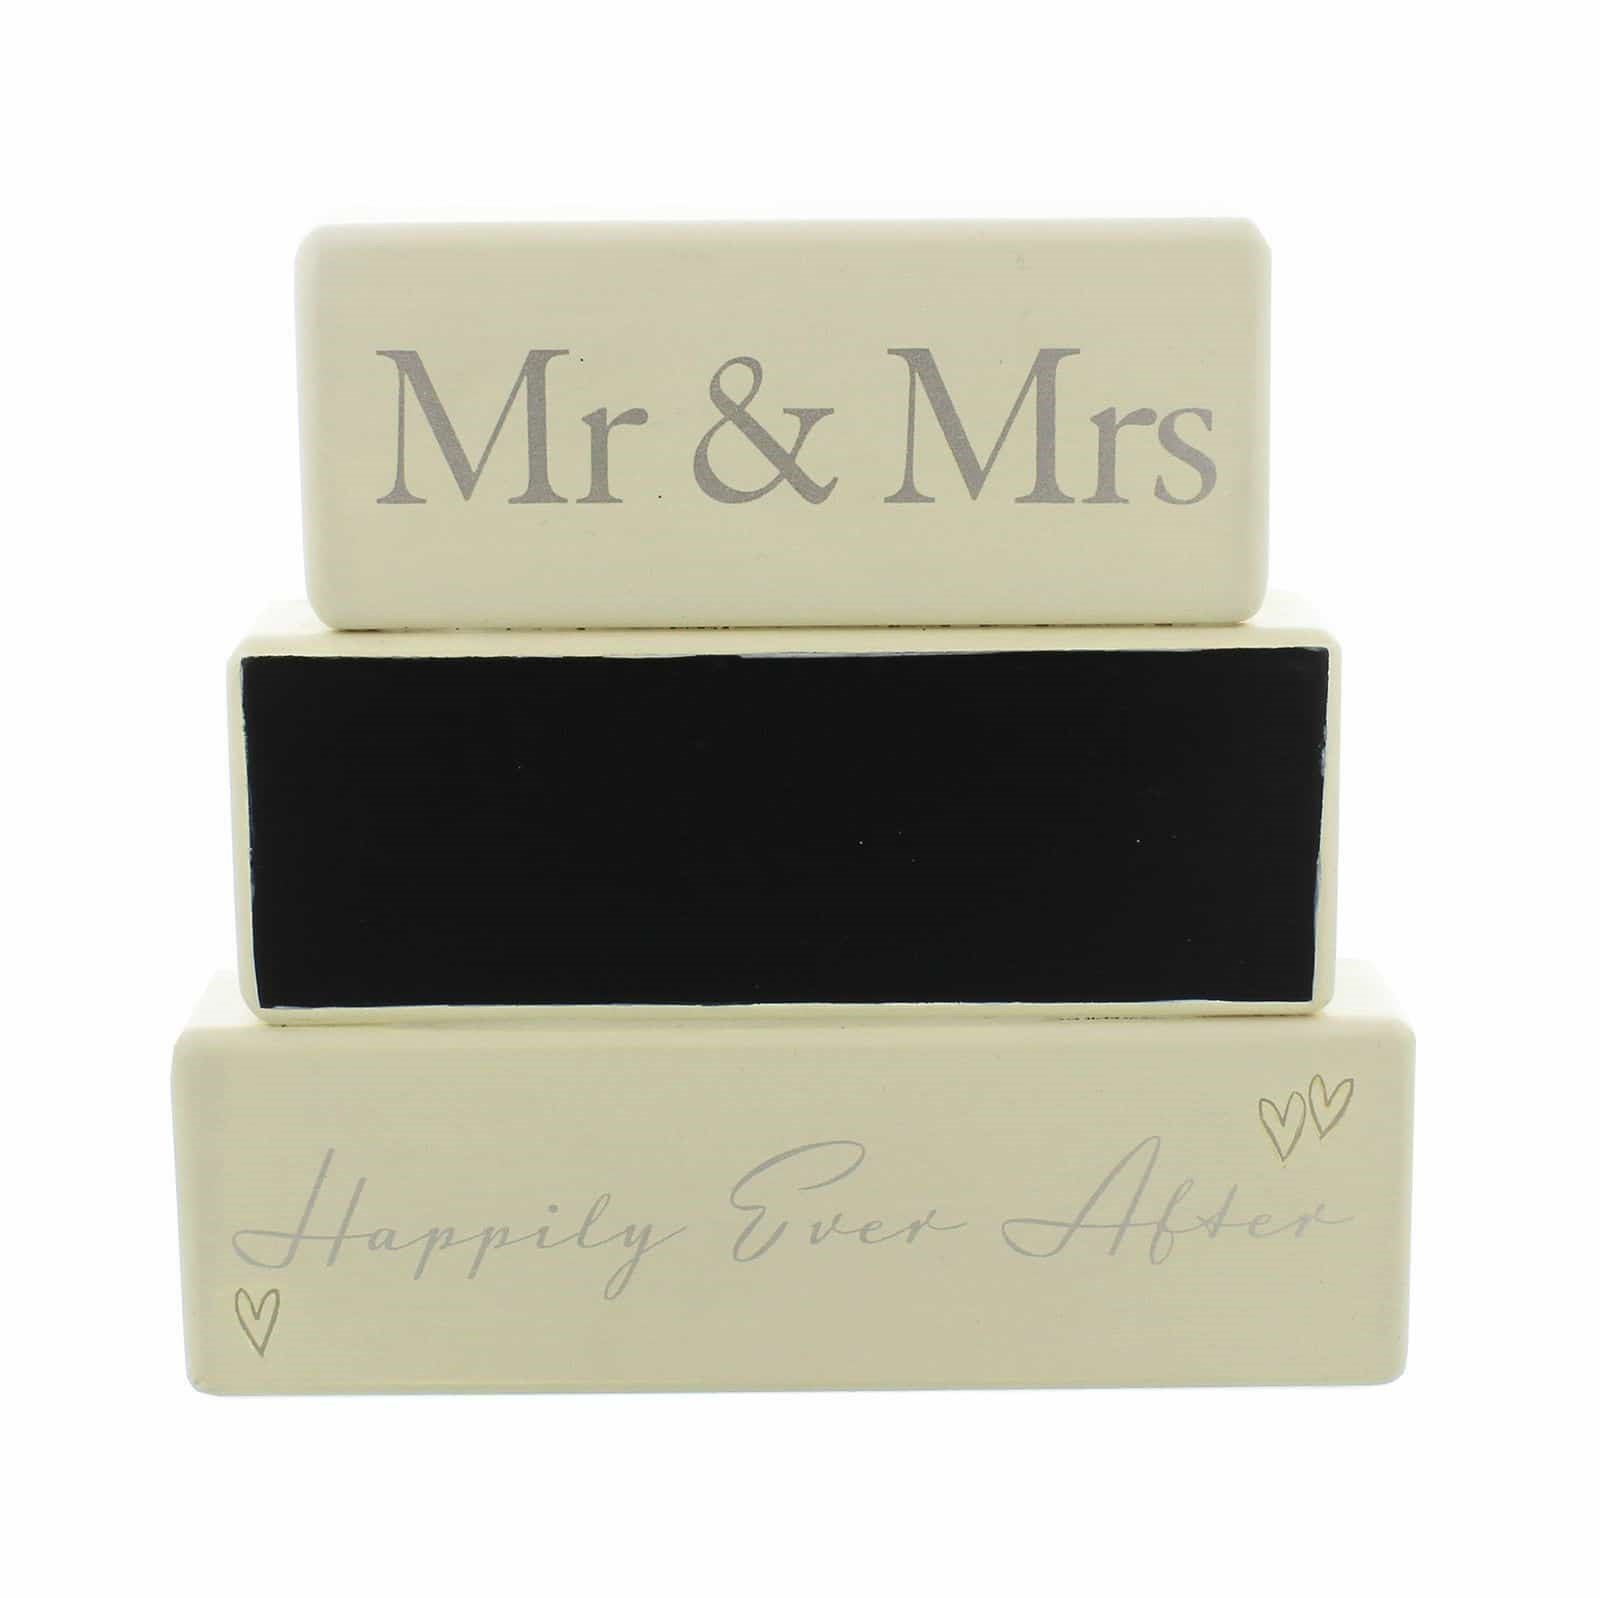 Mr & Mrs Amore Mantel Block